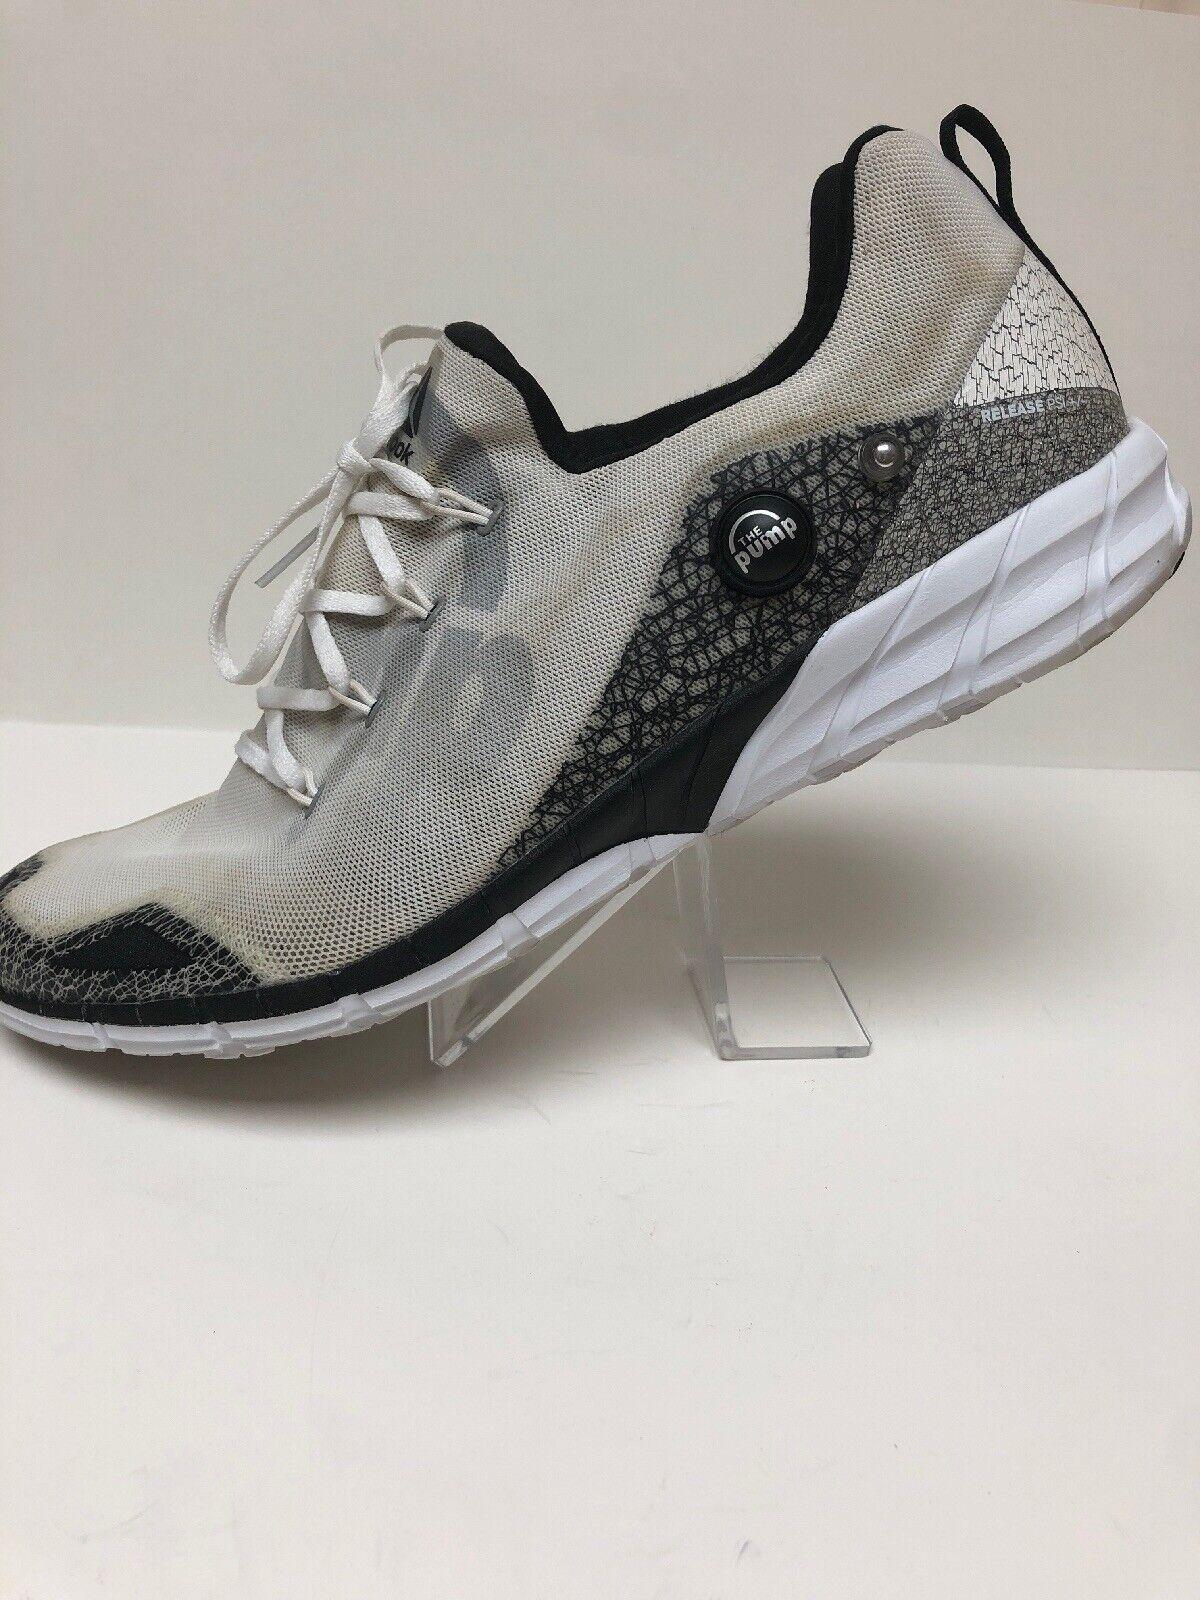 Reebok Pump Running shoes ar2403 US Men's Size 14